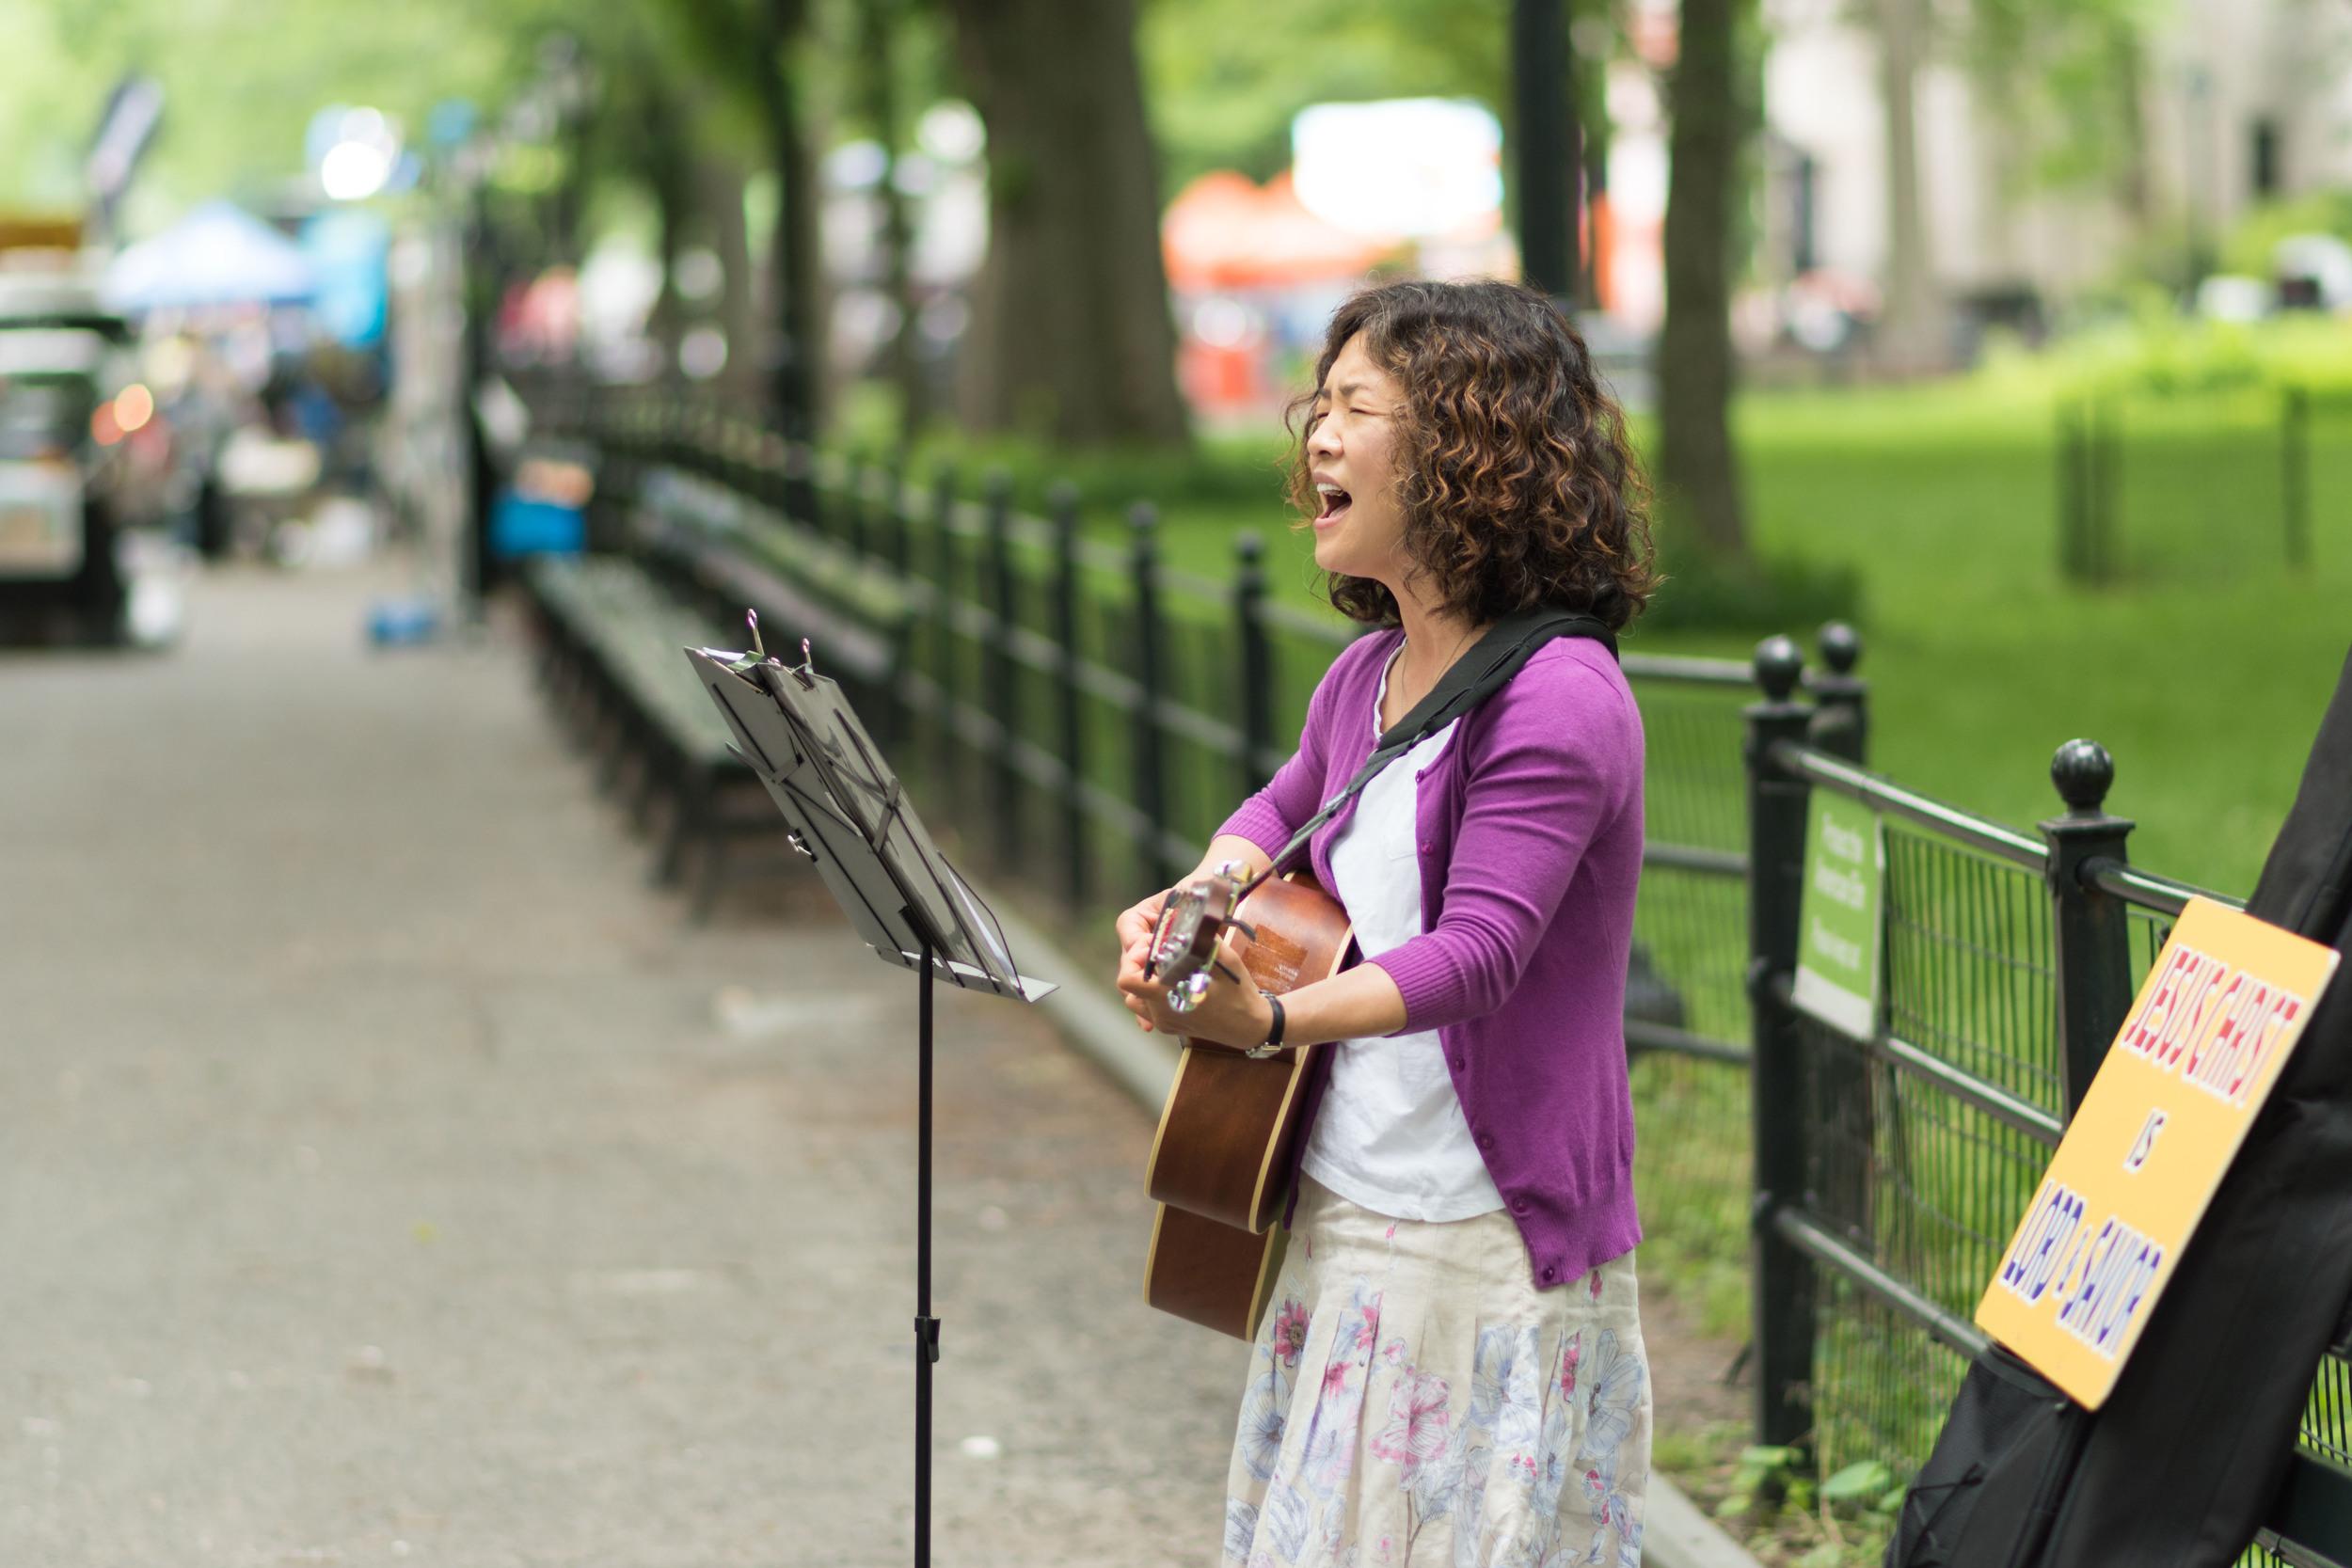 2015_06_20 Song_Central Park Gospel_013.jpg